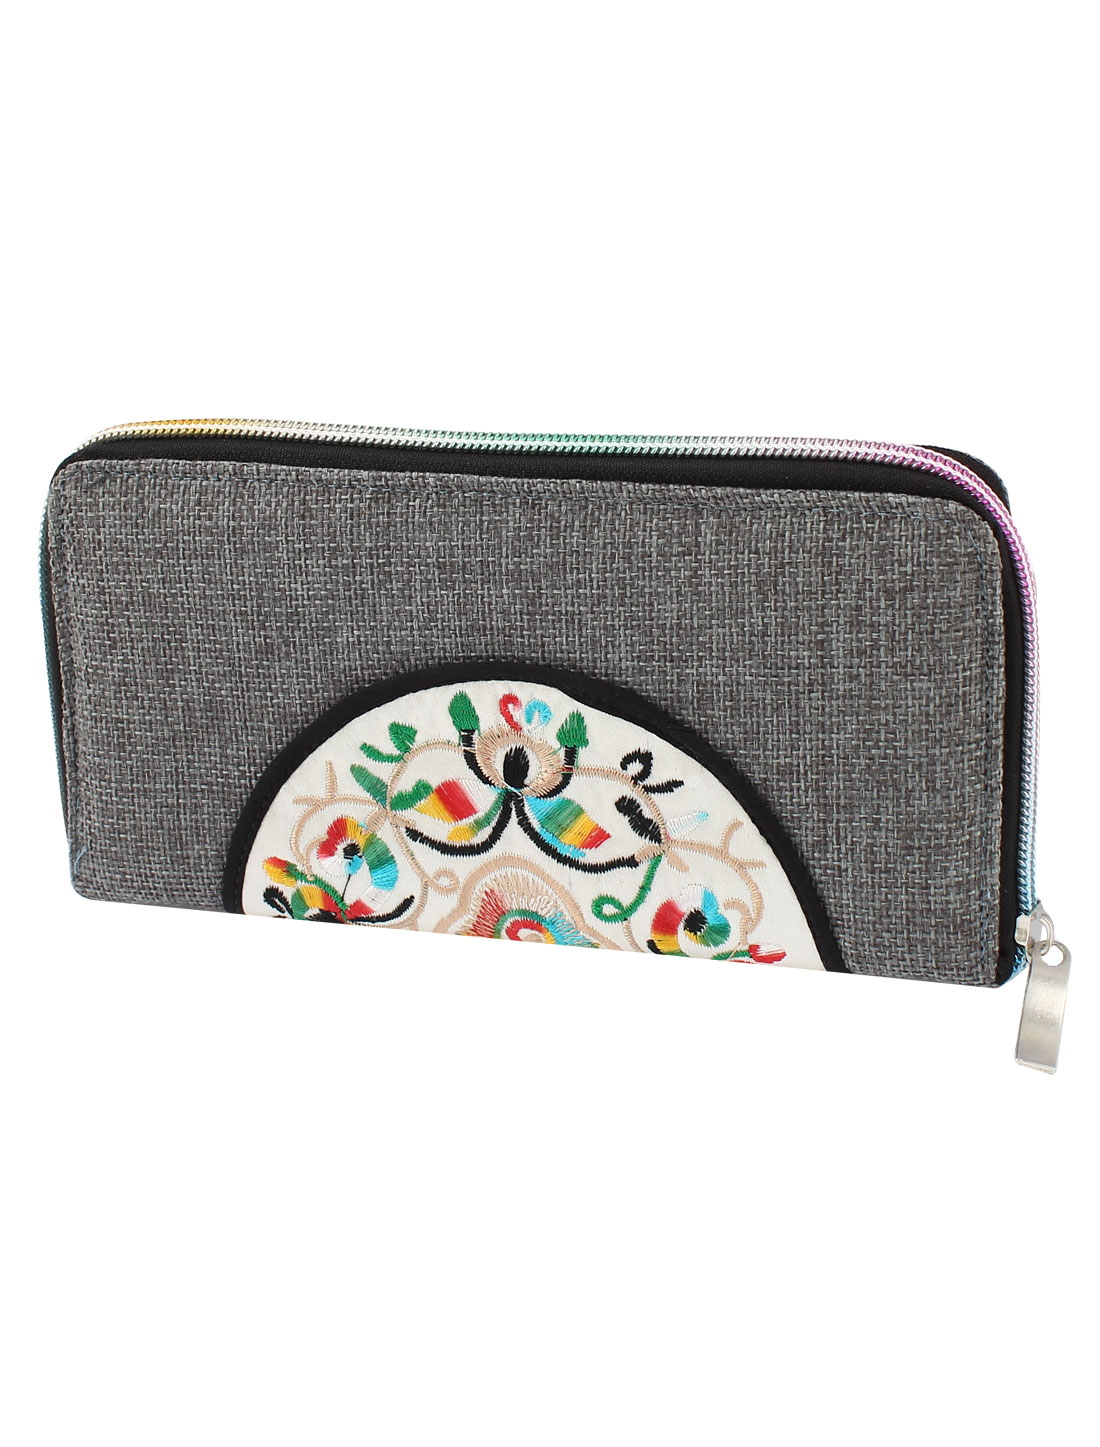 Gray Linen Rectangle Design Floral Pattern Zipper Closure Wallet Purse for Ladies